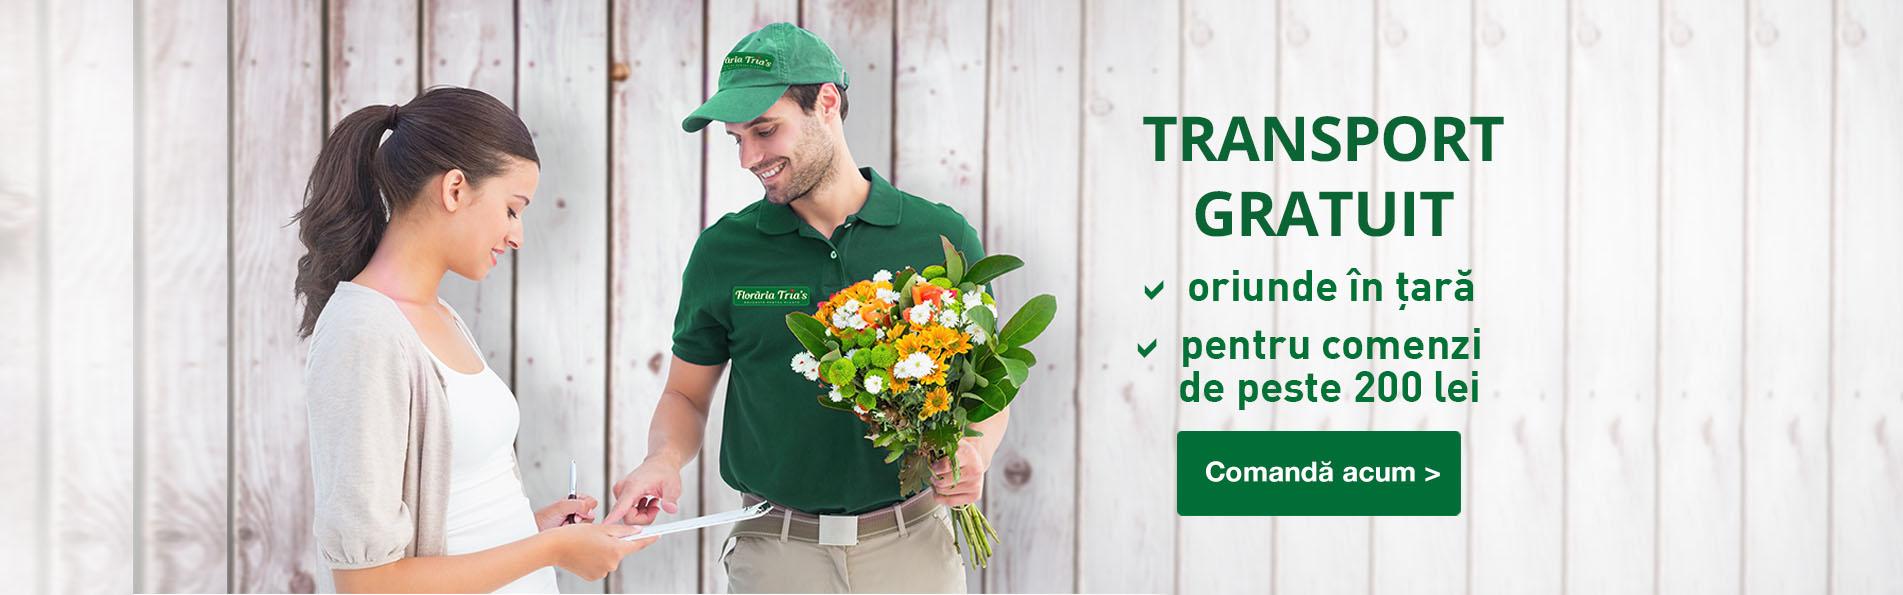 Floraria Trias transport gratuit 200lei banner_site_1903x595 site